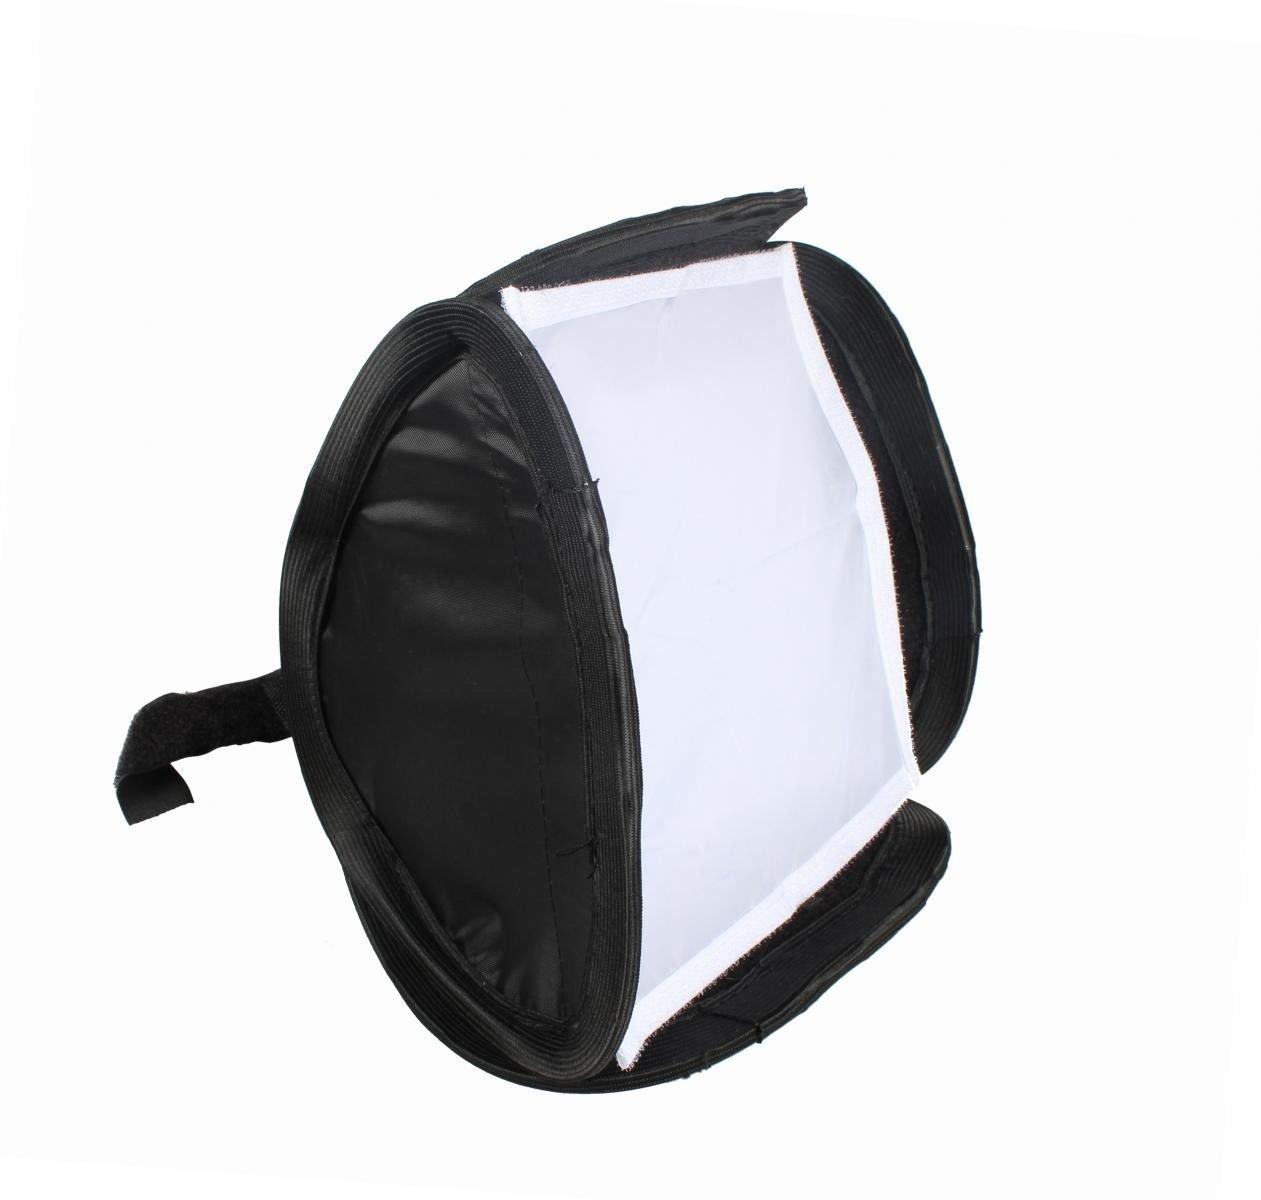 23cm 9 Portable Softbox Soft Box for Flash Light Speedlite Photo Tent Shooting